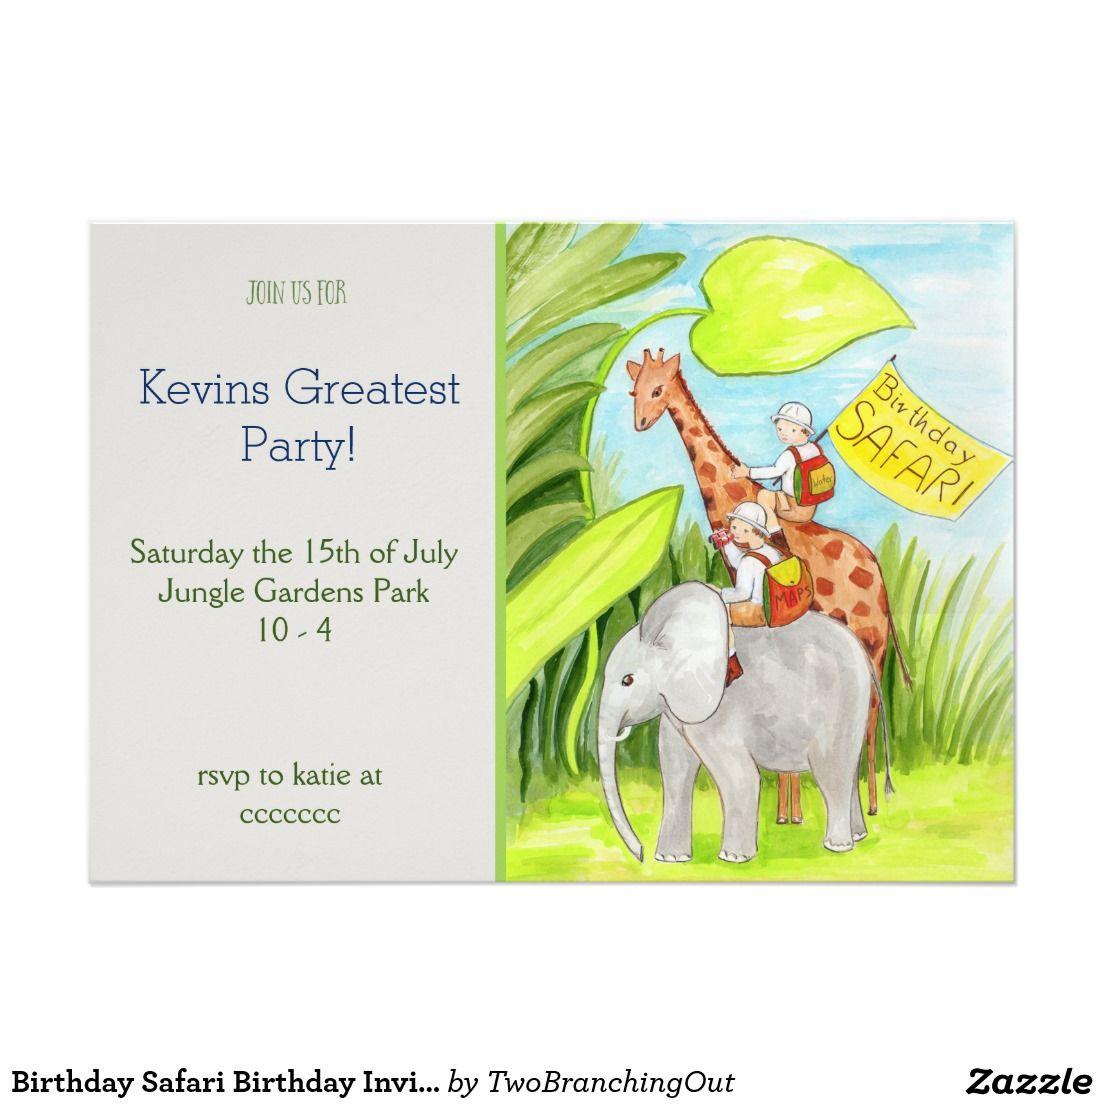 Birthday Safari Birthday Invite